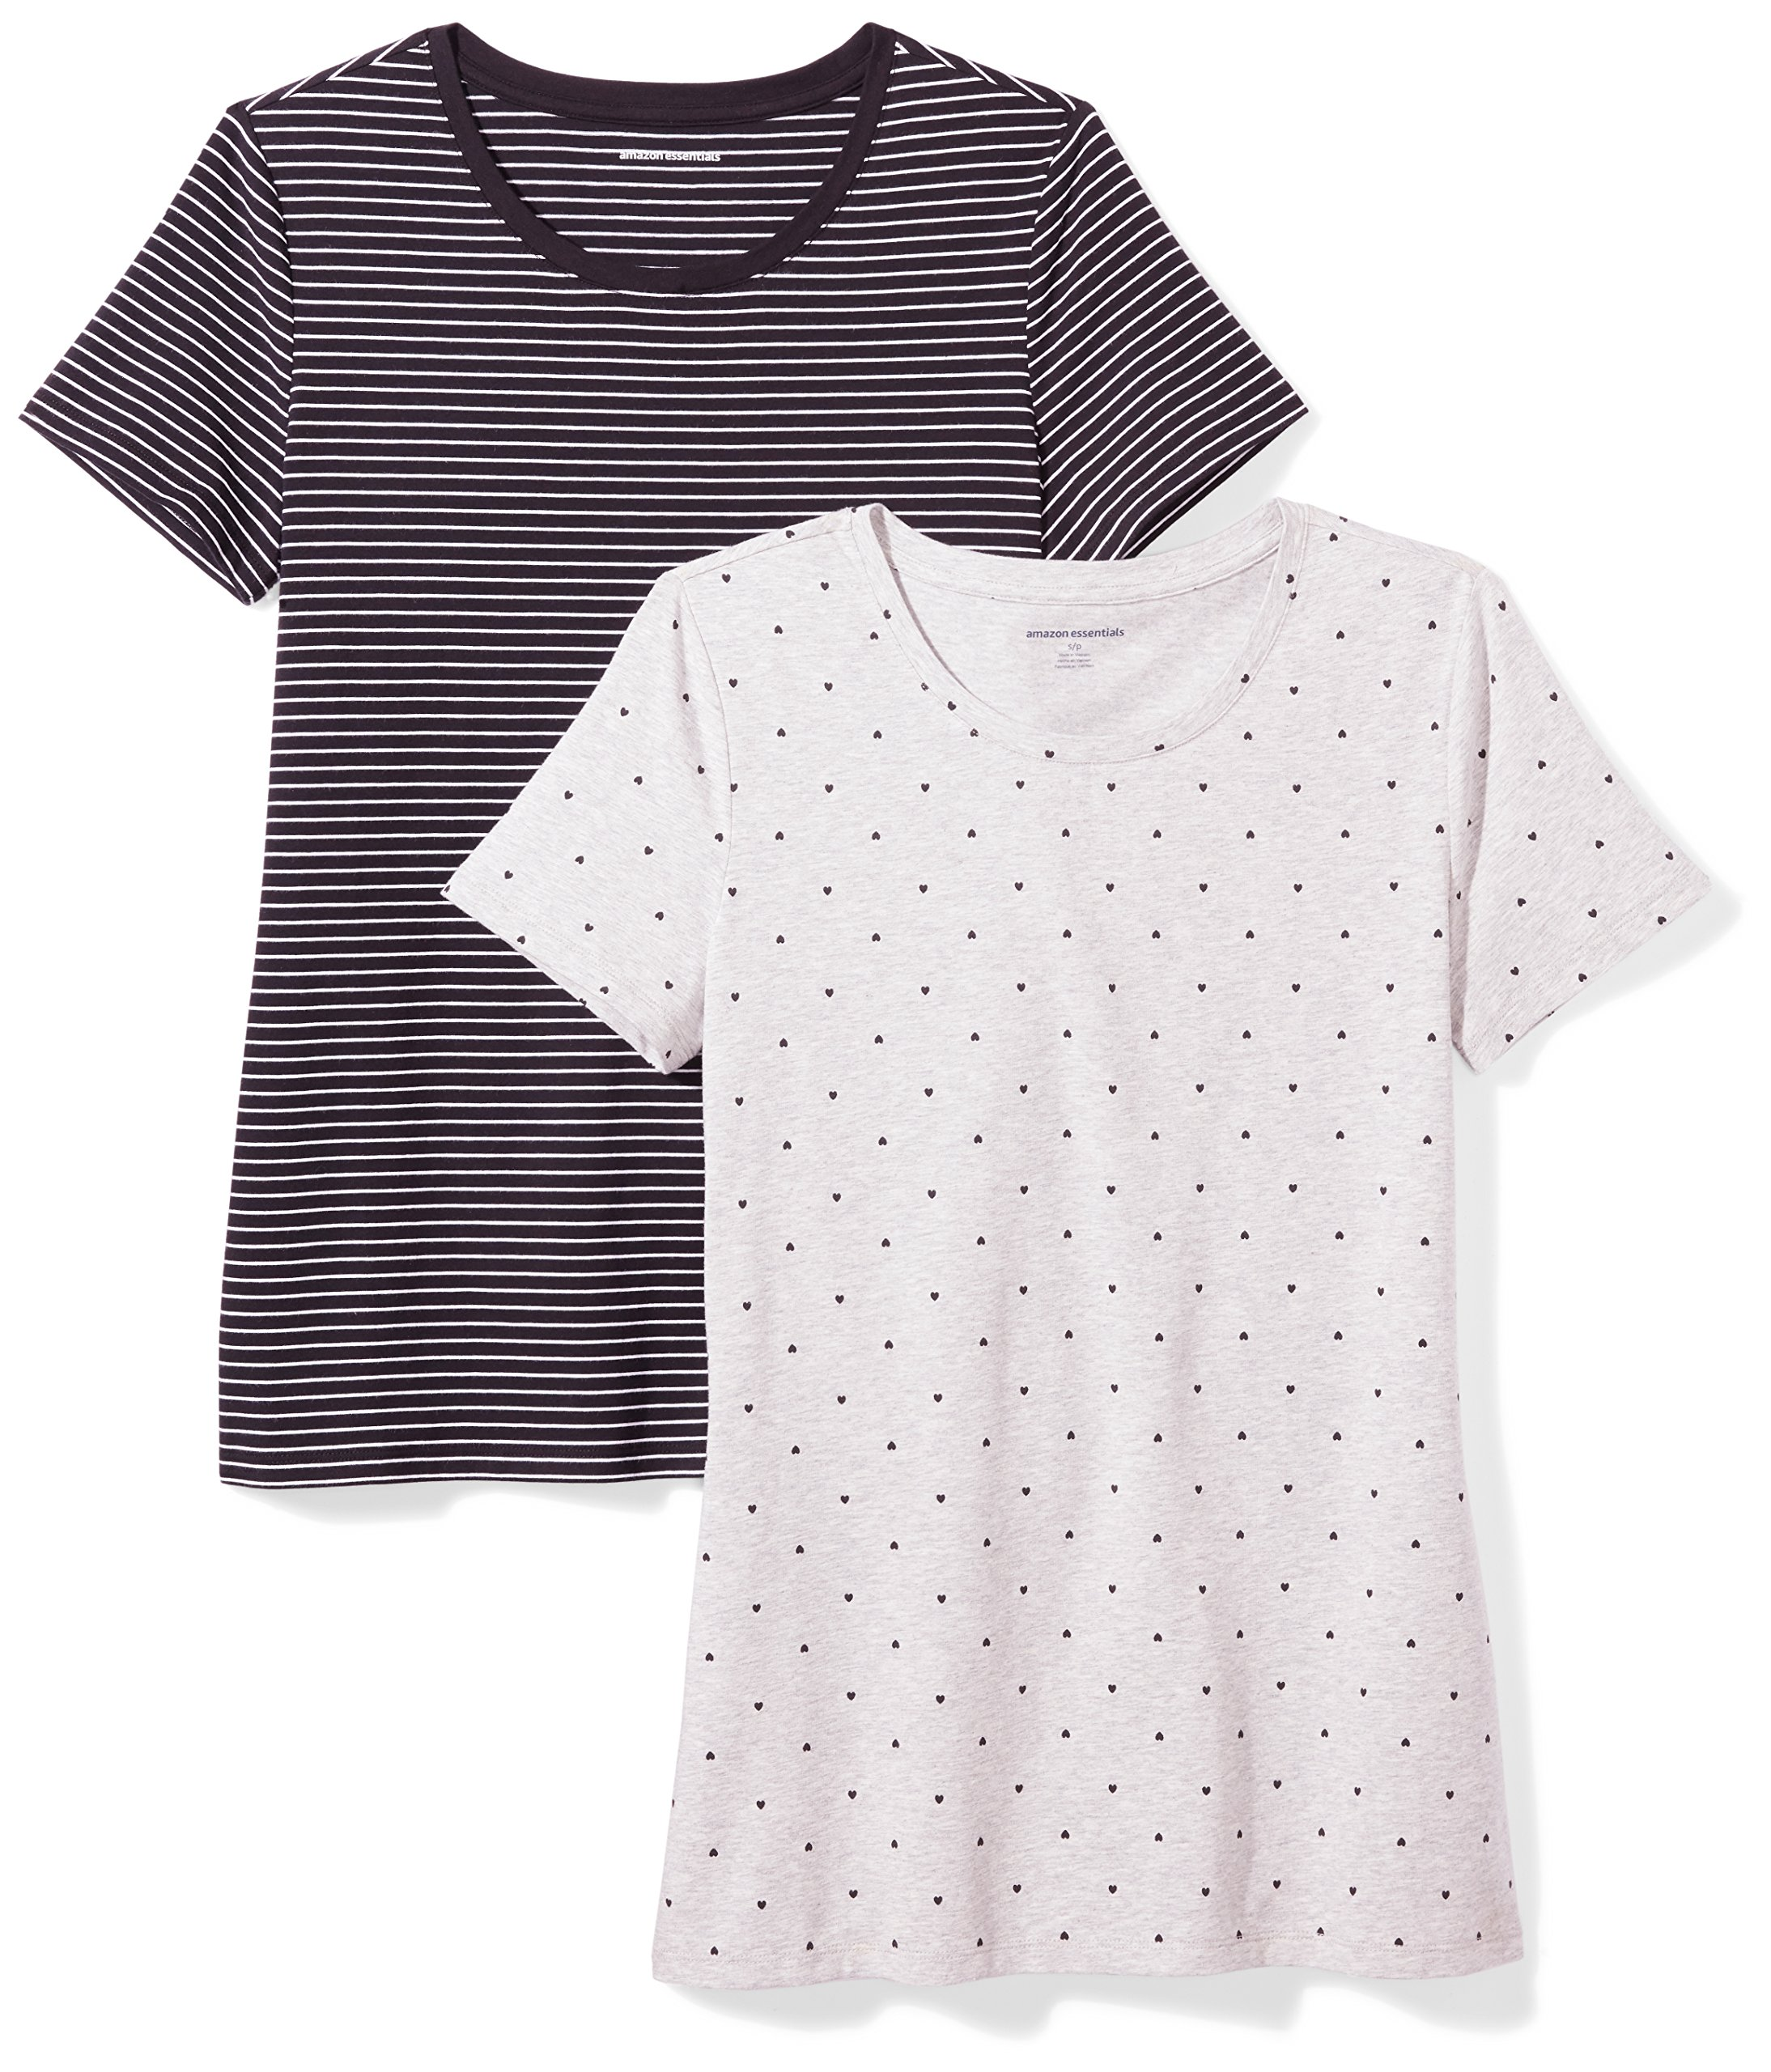 Amazon Essentials Women's 2-Pack Short-Sleeve Crewneck Patterned T-Shirt, Black Stripe/Heart Print, Large